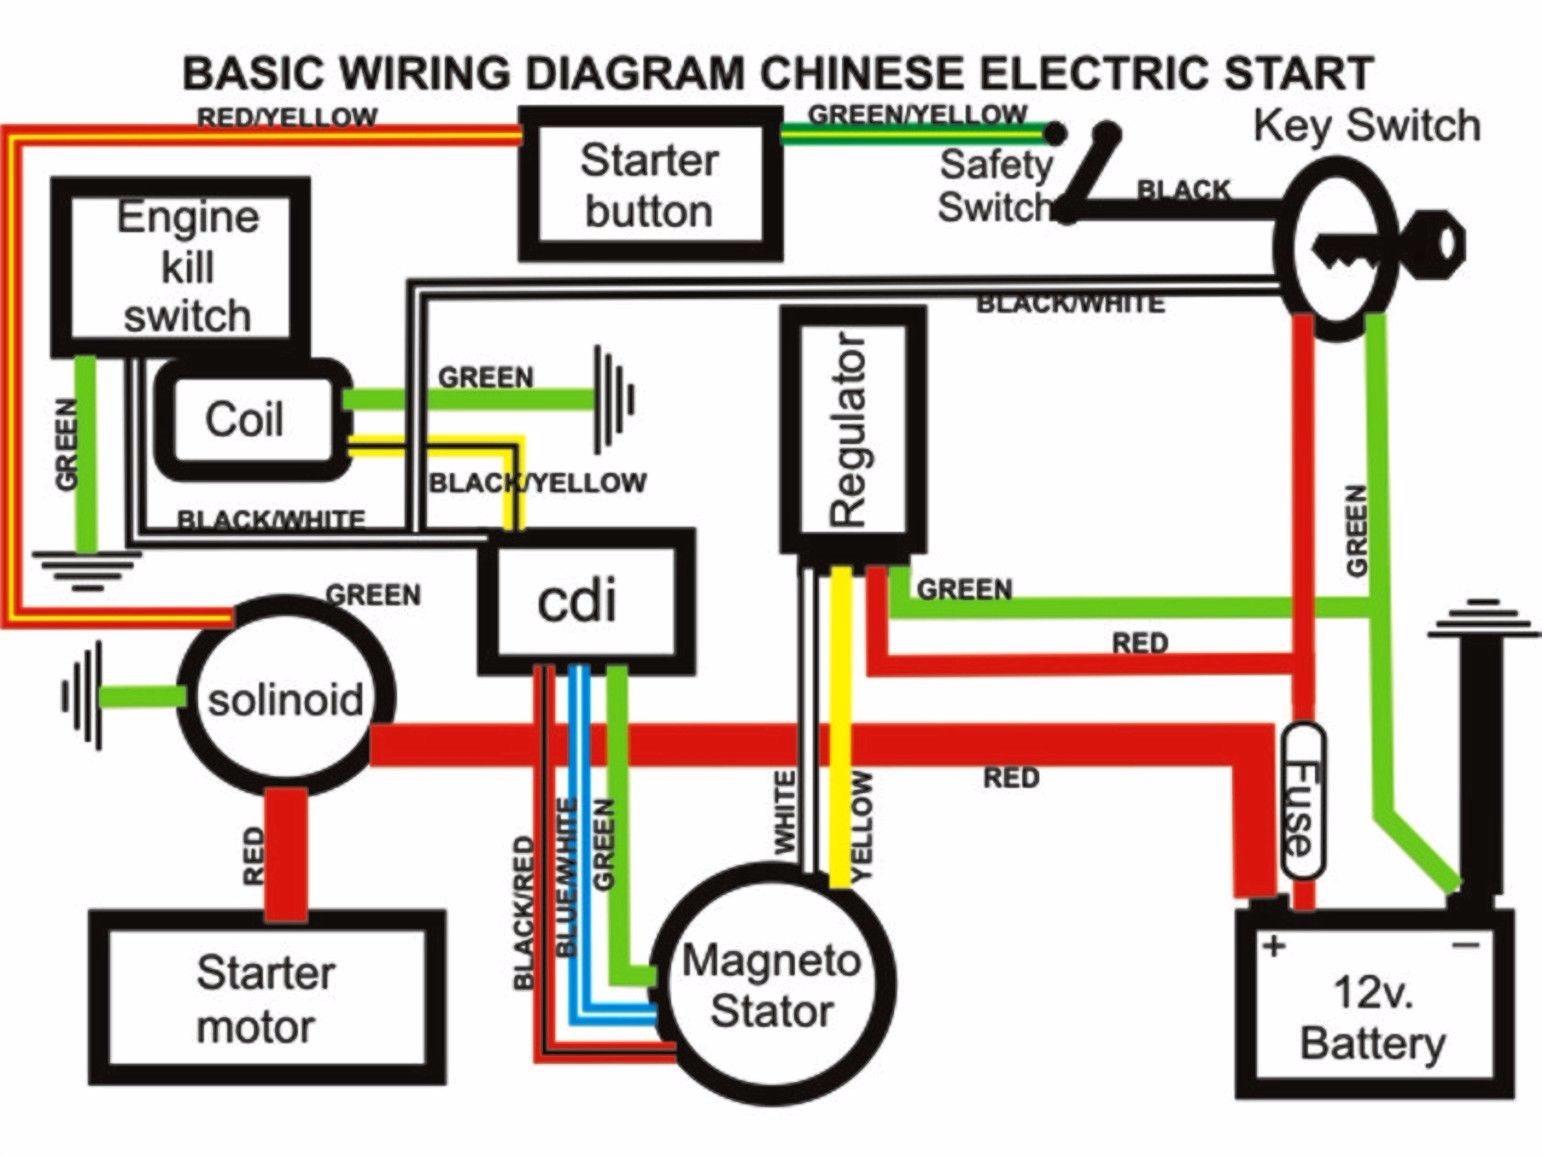 hight resolution of 250 dirt bike wiring harness wiring diagram wiring schematicshonda 250 dirt bike wire diagram wiring diagramhonda